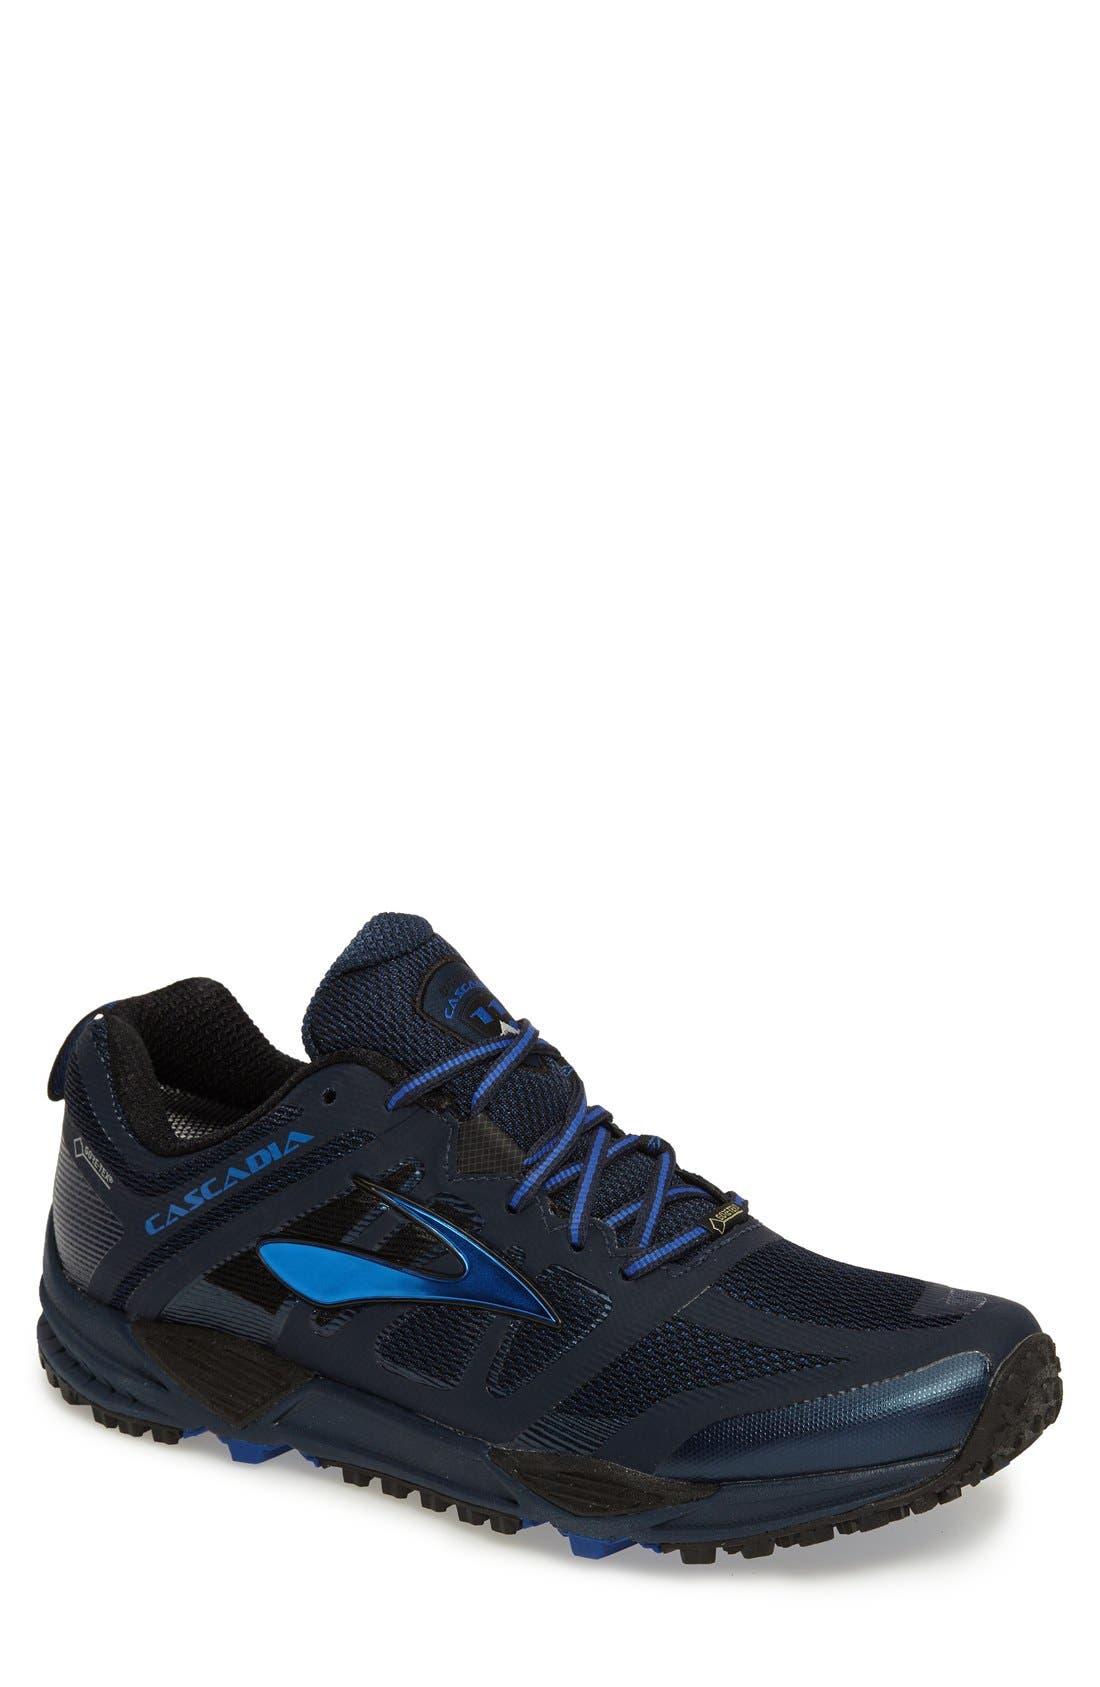 Cascadia 11 GTX Trail Running Shoe,                             Main thumbnail 1, color,                             409